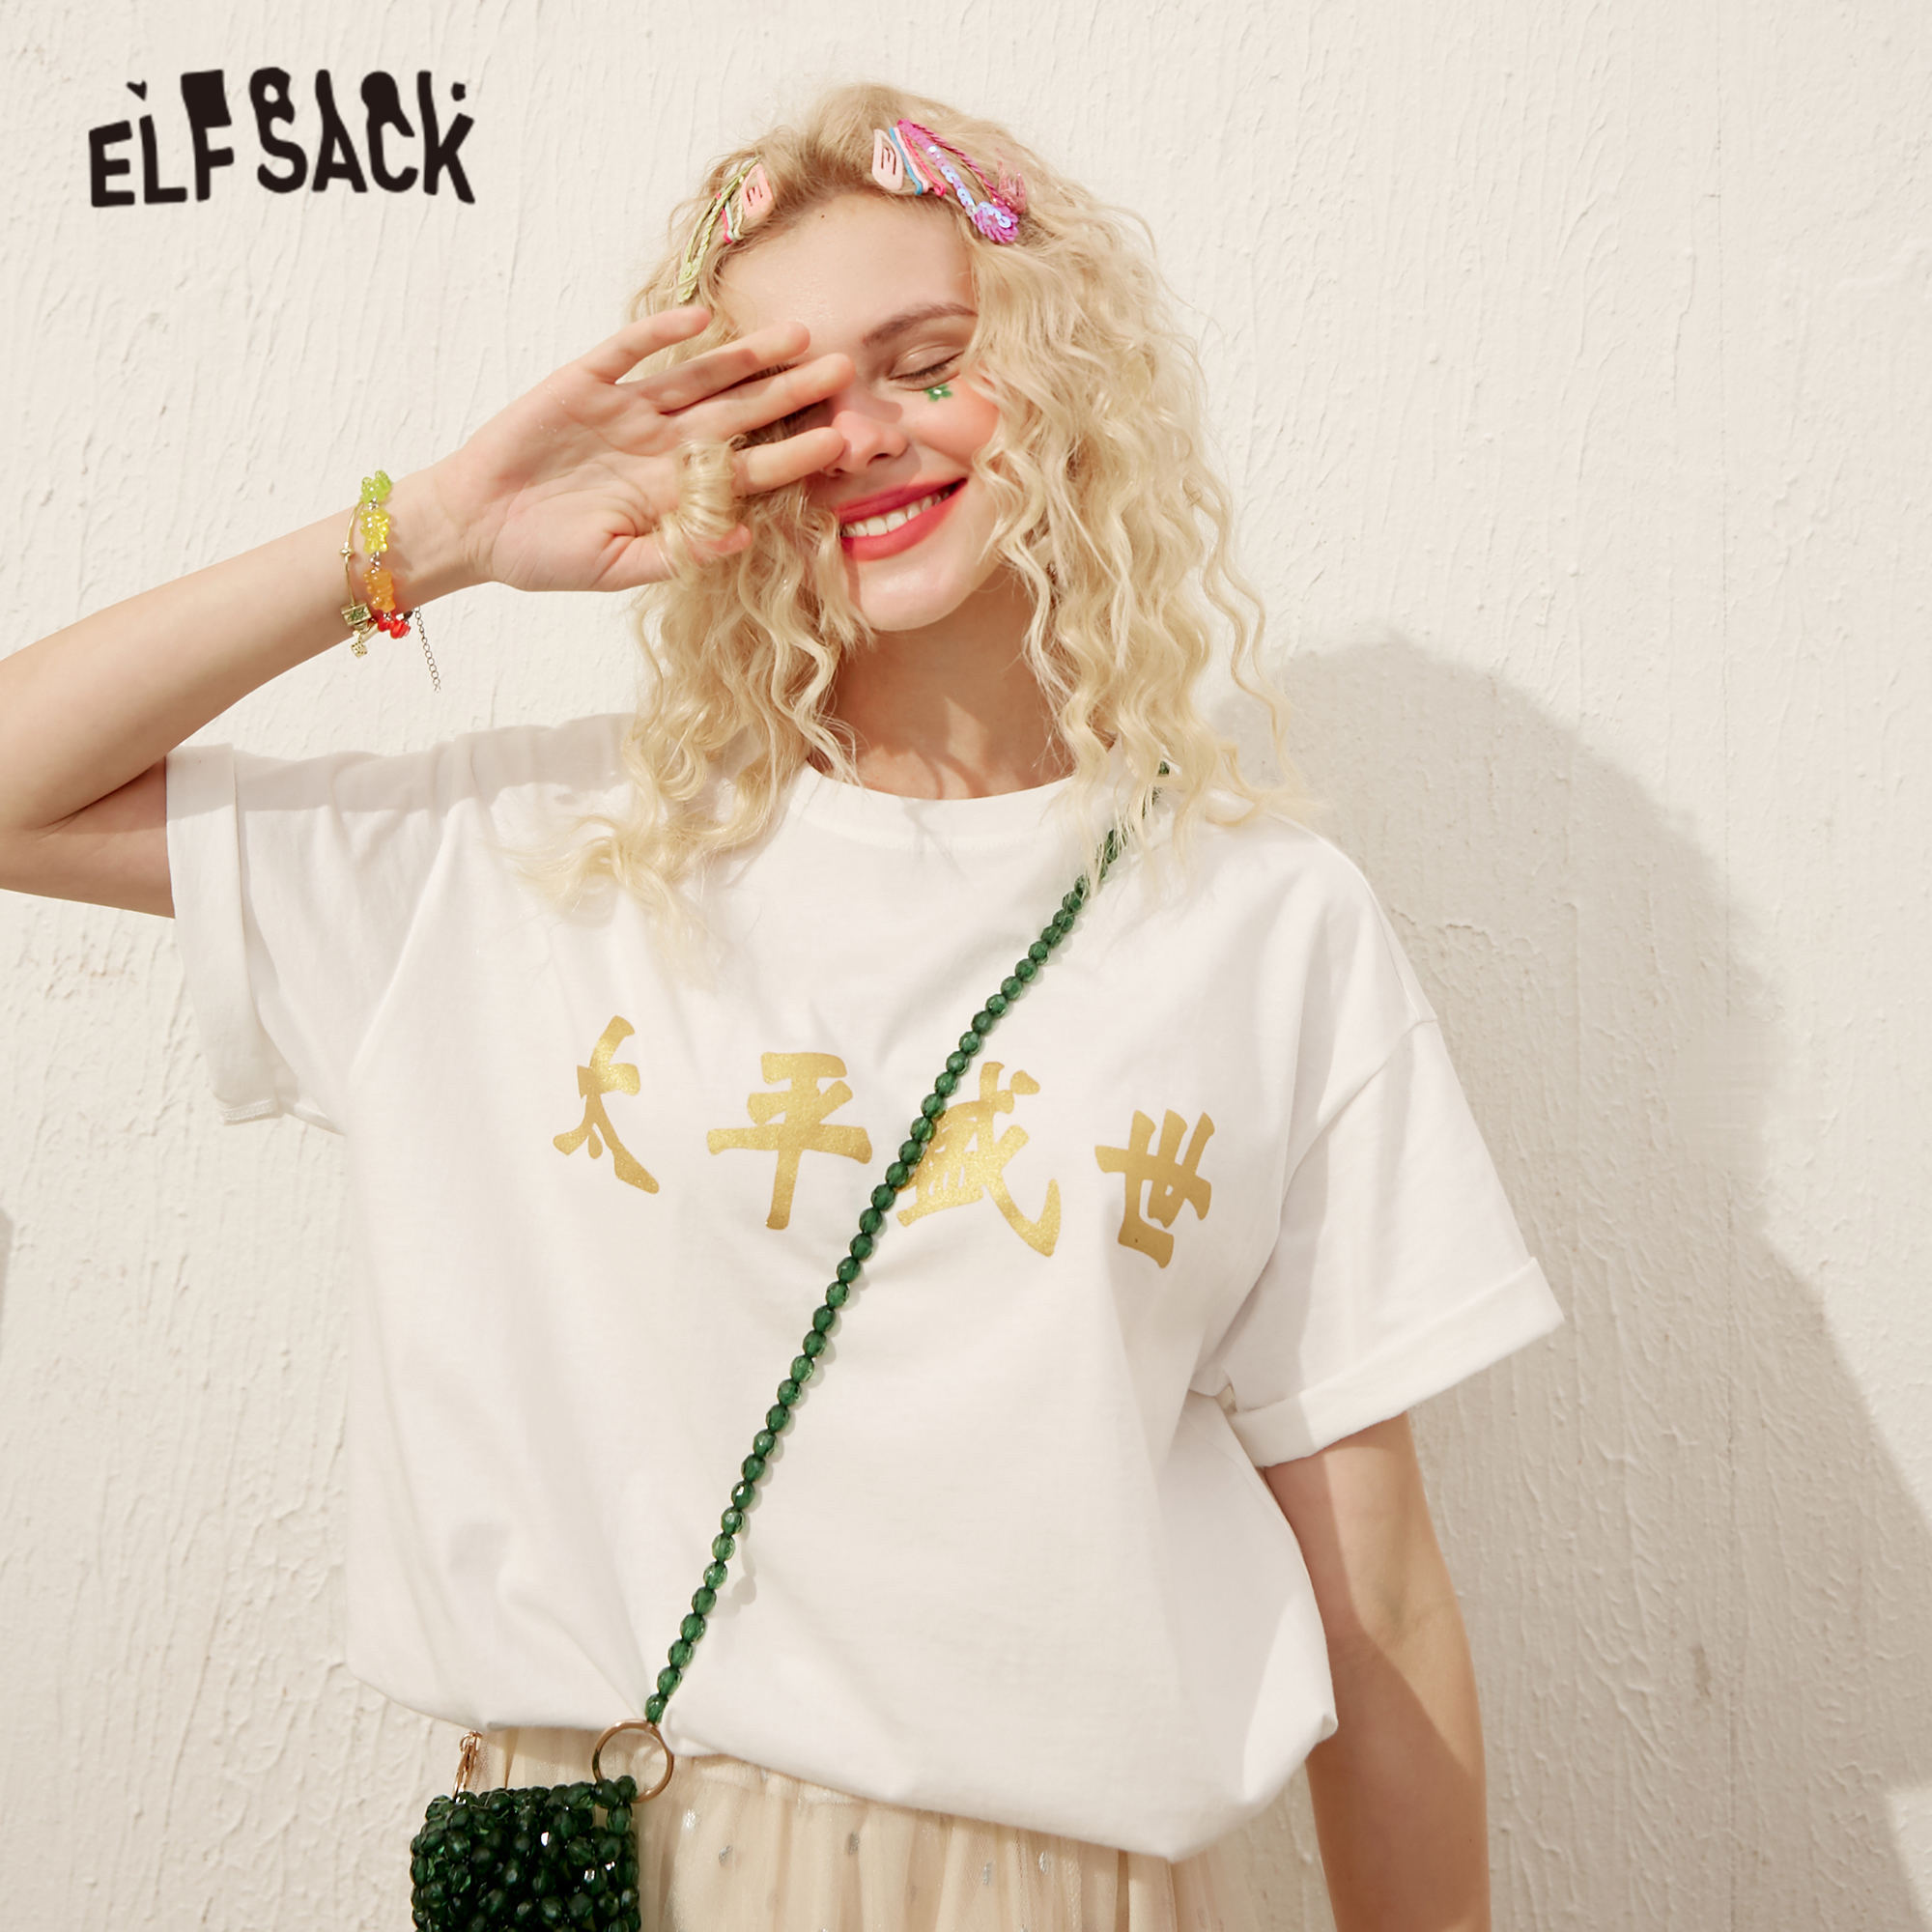 Elfsack 白文字印刷ミニマルカジュアル女性 tシャツ 2020 夏エルフ半袖韓国女性の毎日の基本的なトップス